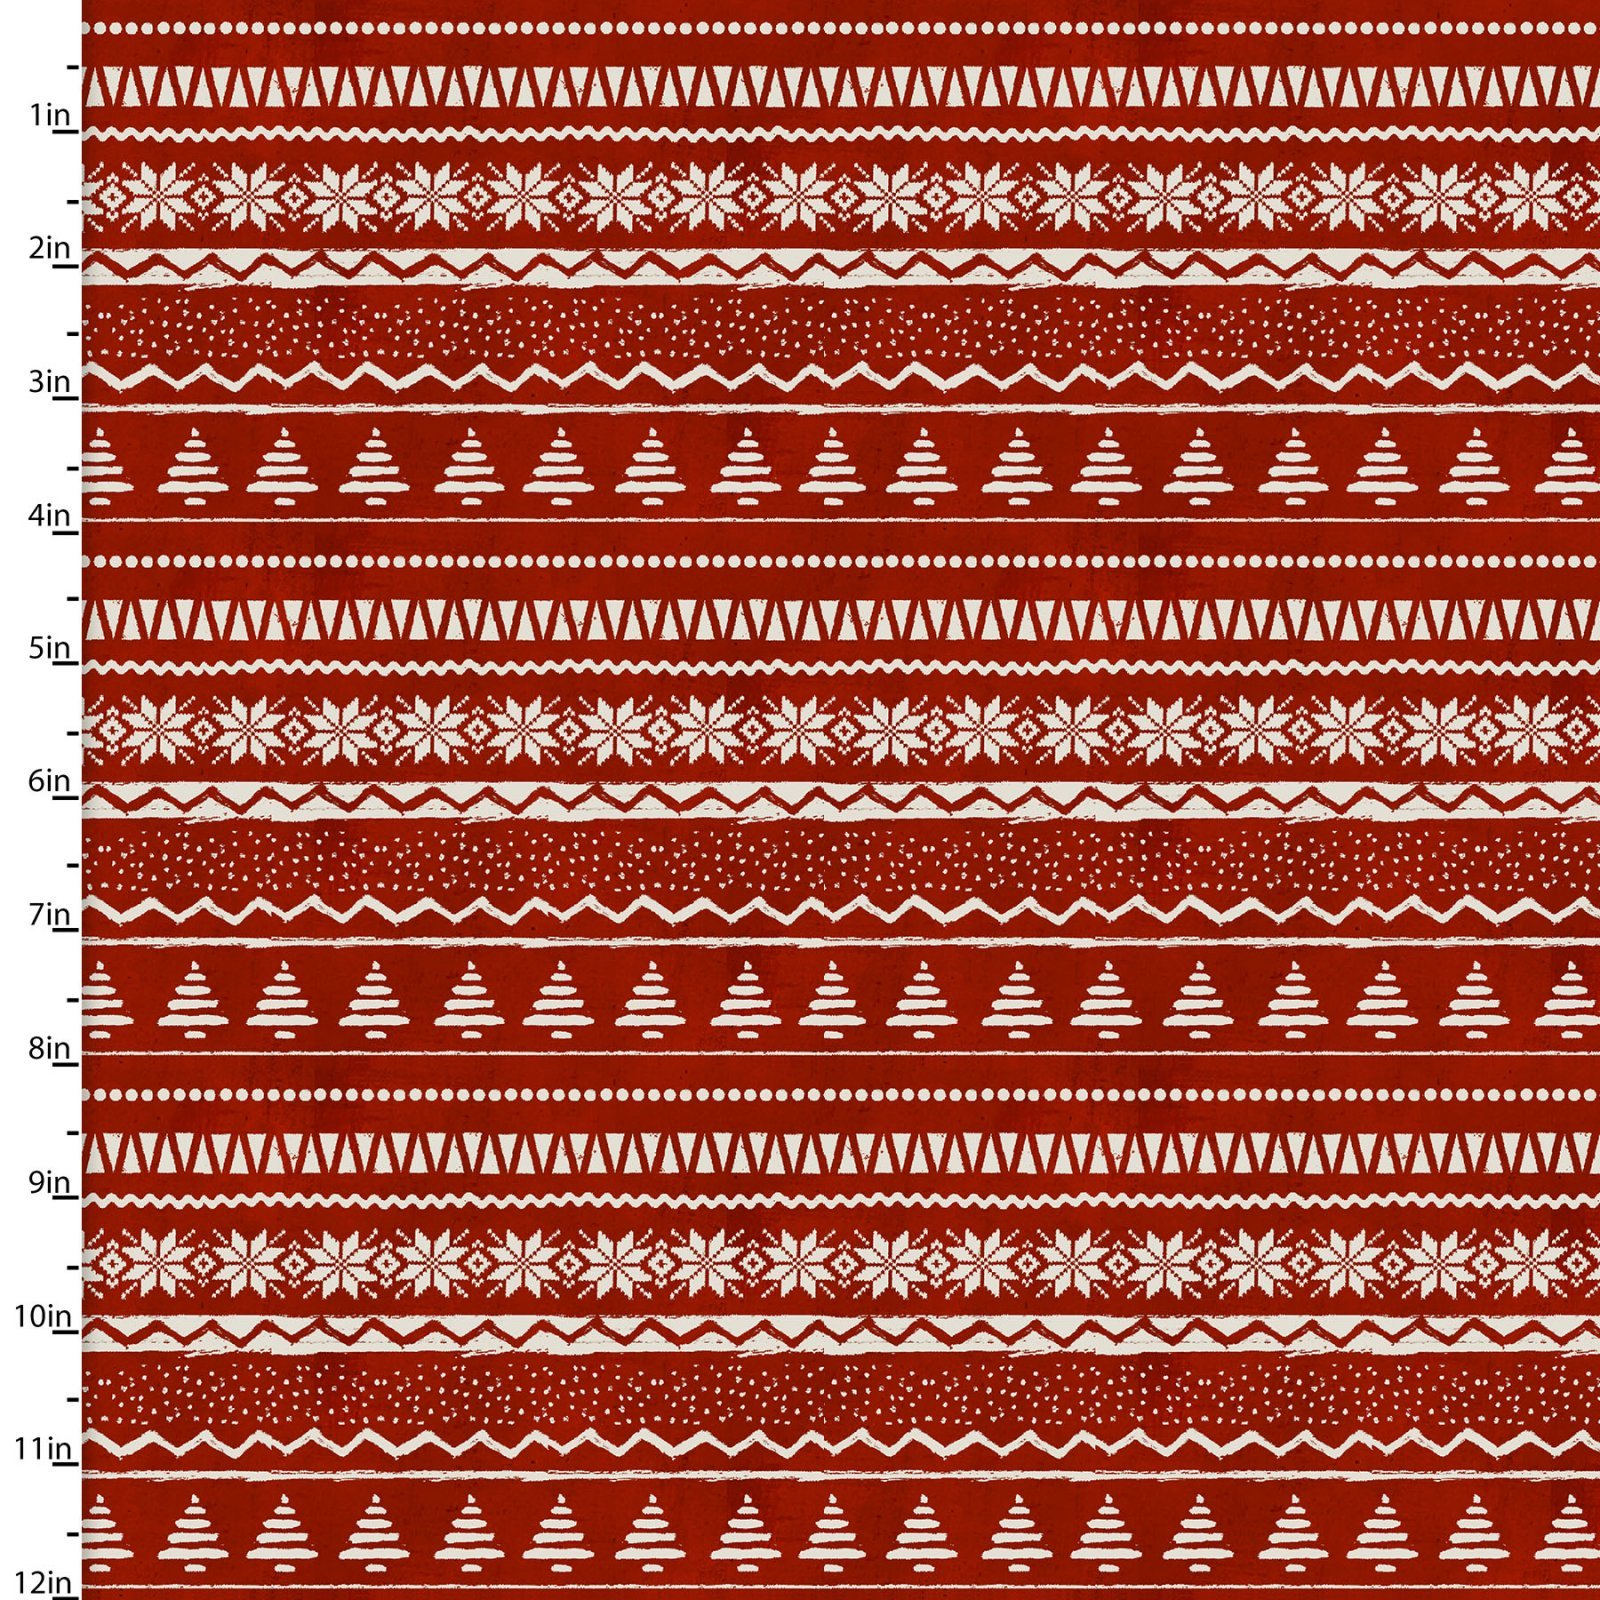 3JINGLEALLWAY 16630 - RED - SWEATER PRINT